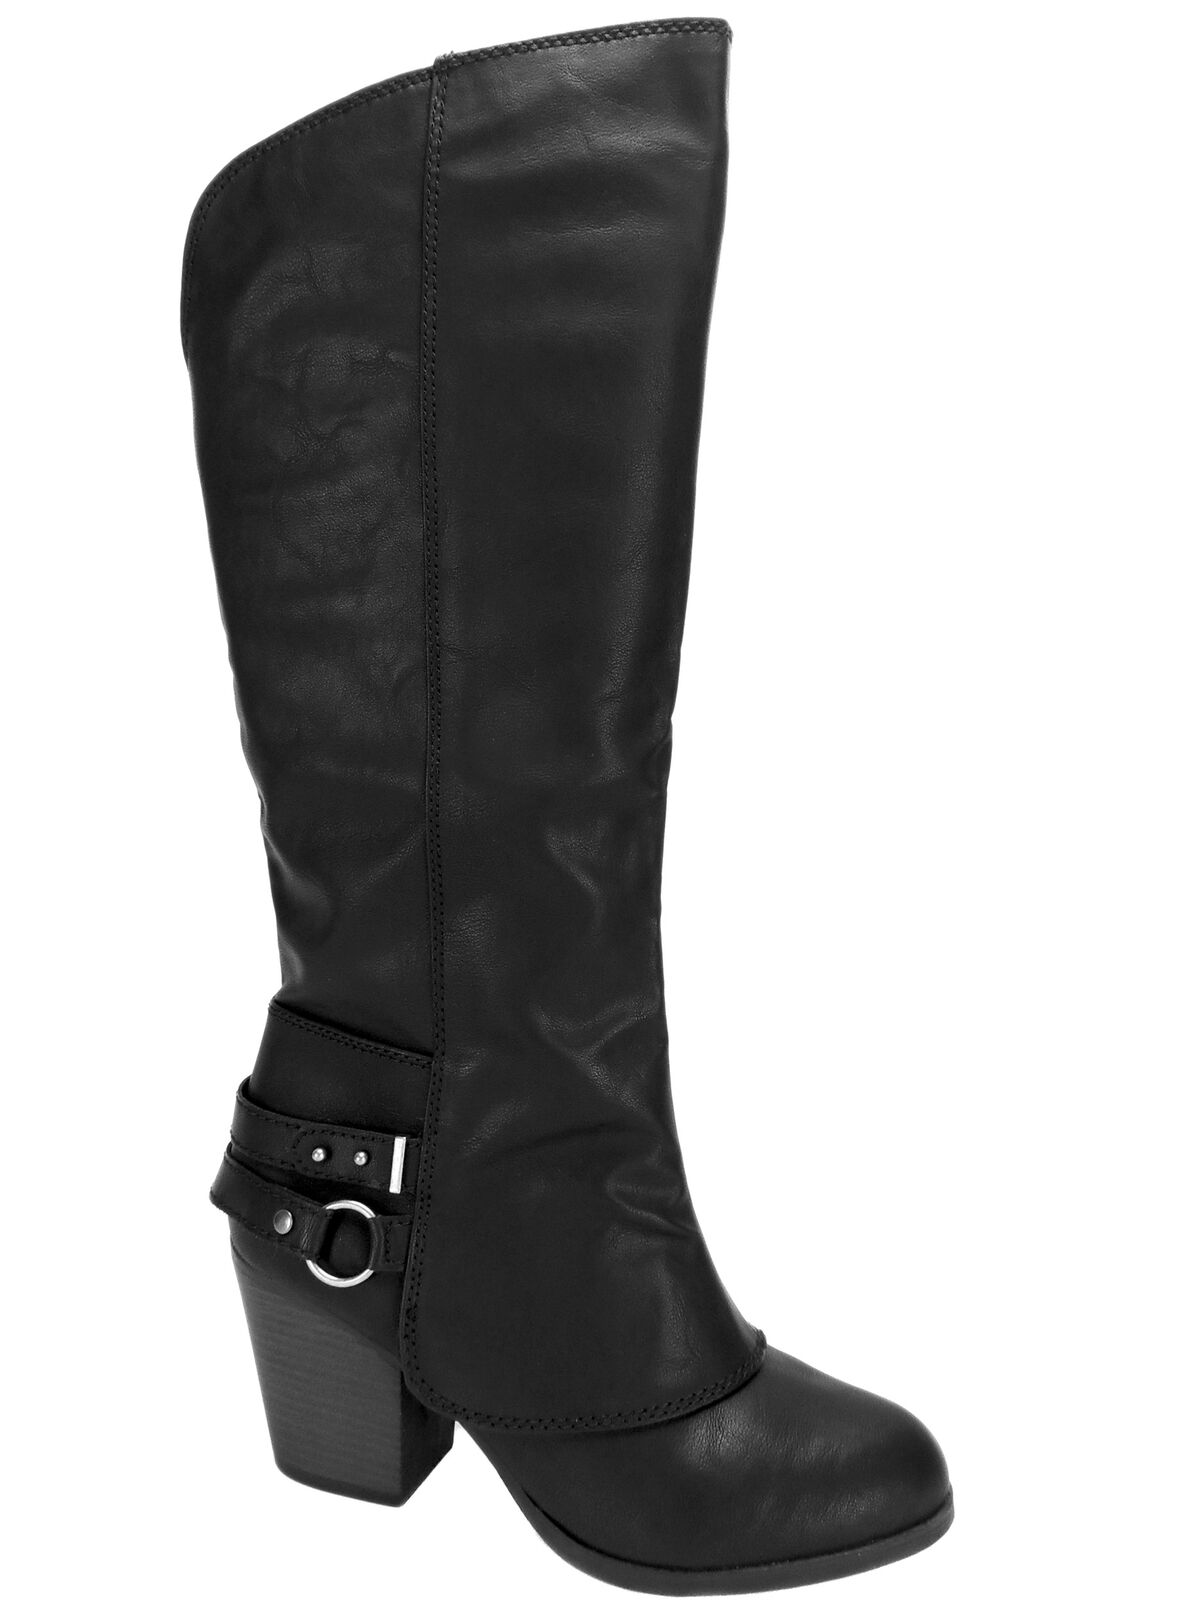 American Rag Women's Eboni Cuffed Cuffed Cuffed Boots Black Size 10 Size M f2d0d2